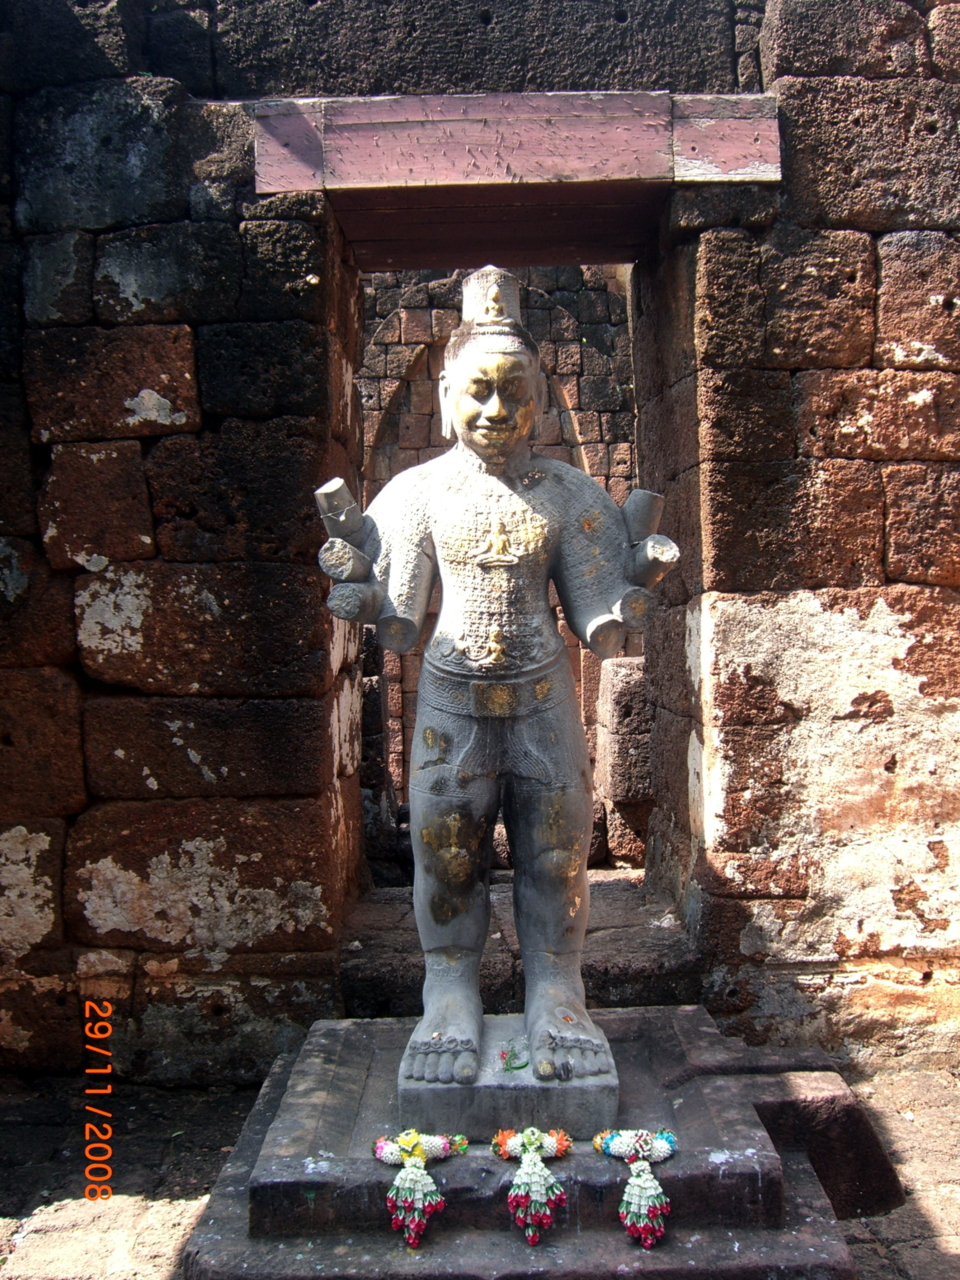 Bodhisattva Avalokitesvara statue, Prasat Muang Sing Historical Park, Kanchanaburi, THAILAND